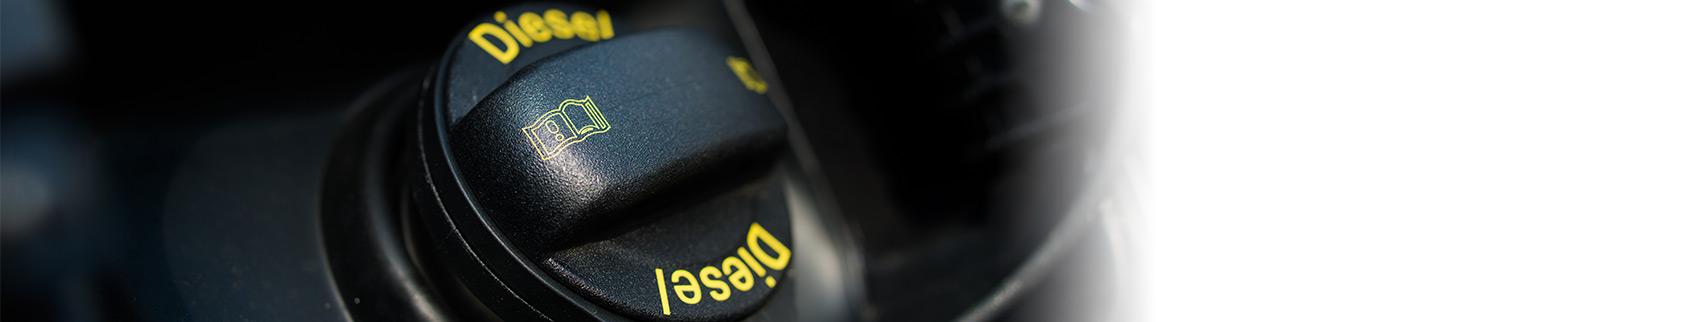 Dieselauto survey